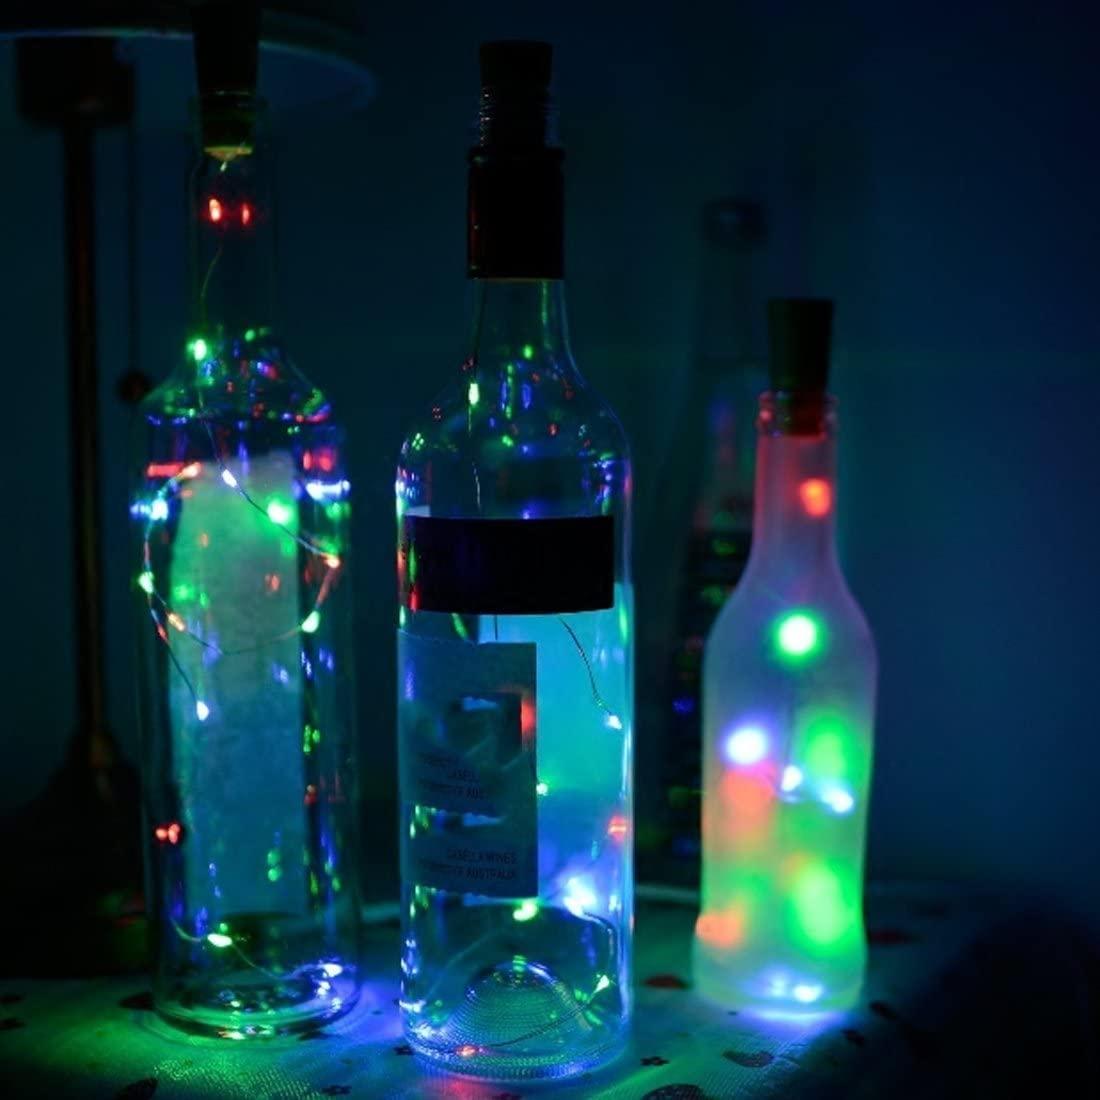 TT-COMMERCE Wine Bottle Lights with Cork,LED Cork Lights for Bottle,Copper Wire Bottle Lights for DIY, Party, Decor, Christmas, Halloween,Wedding(Multicolor)